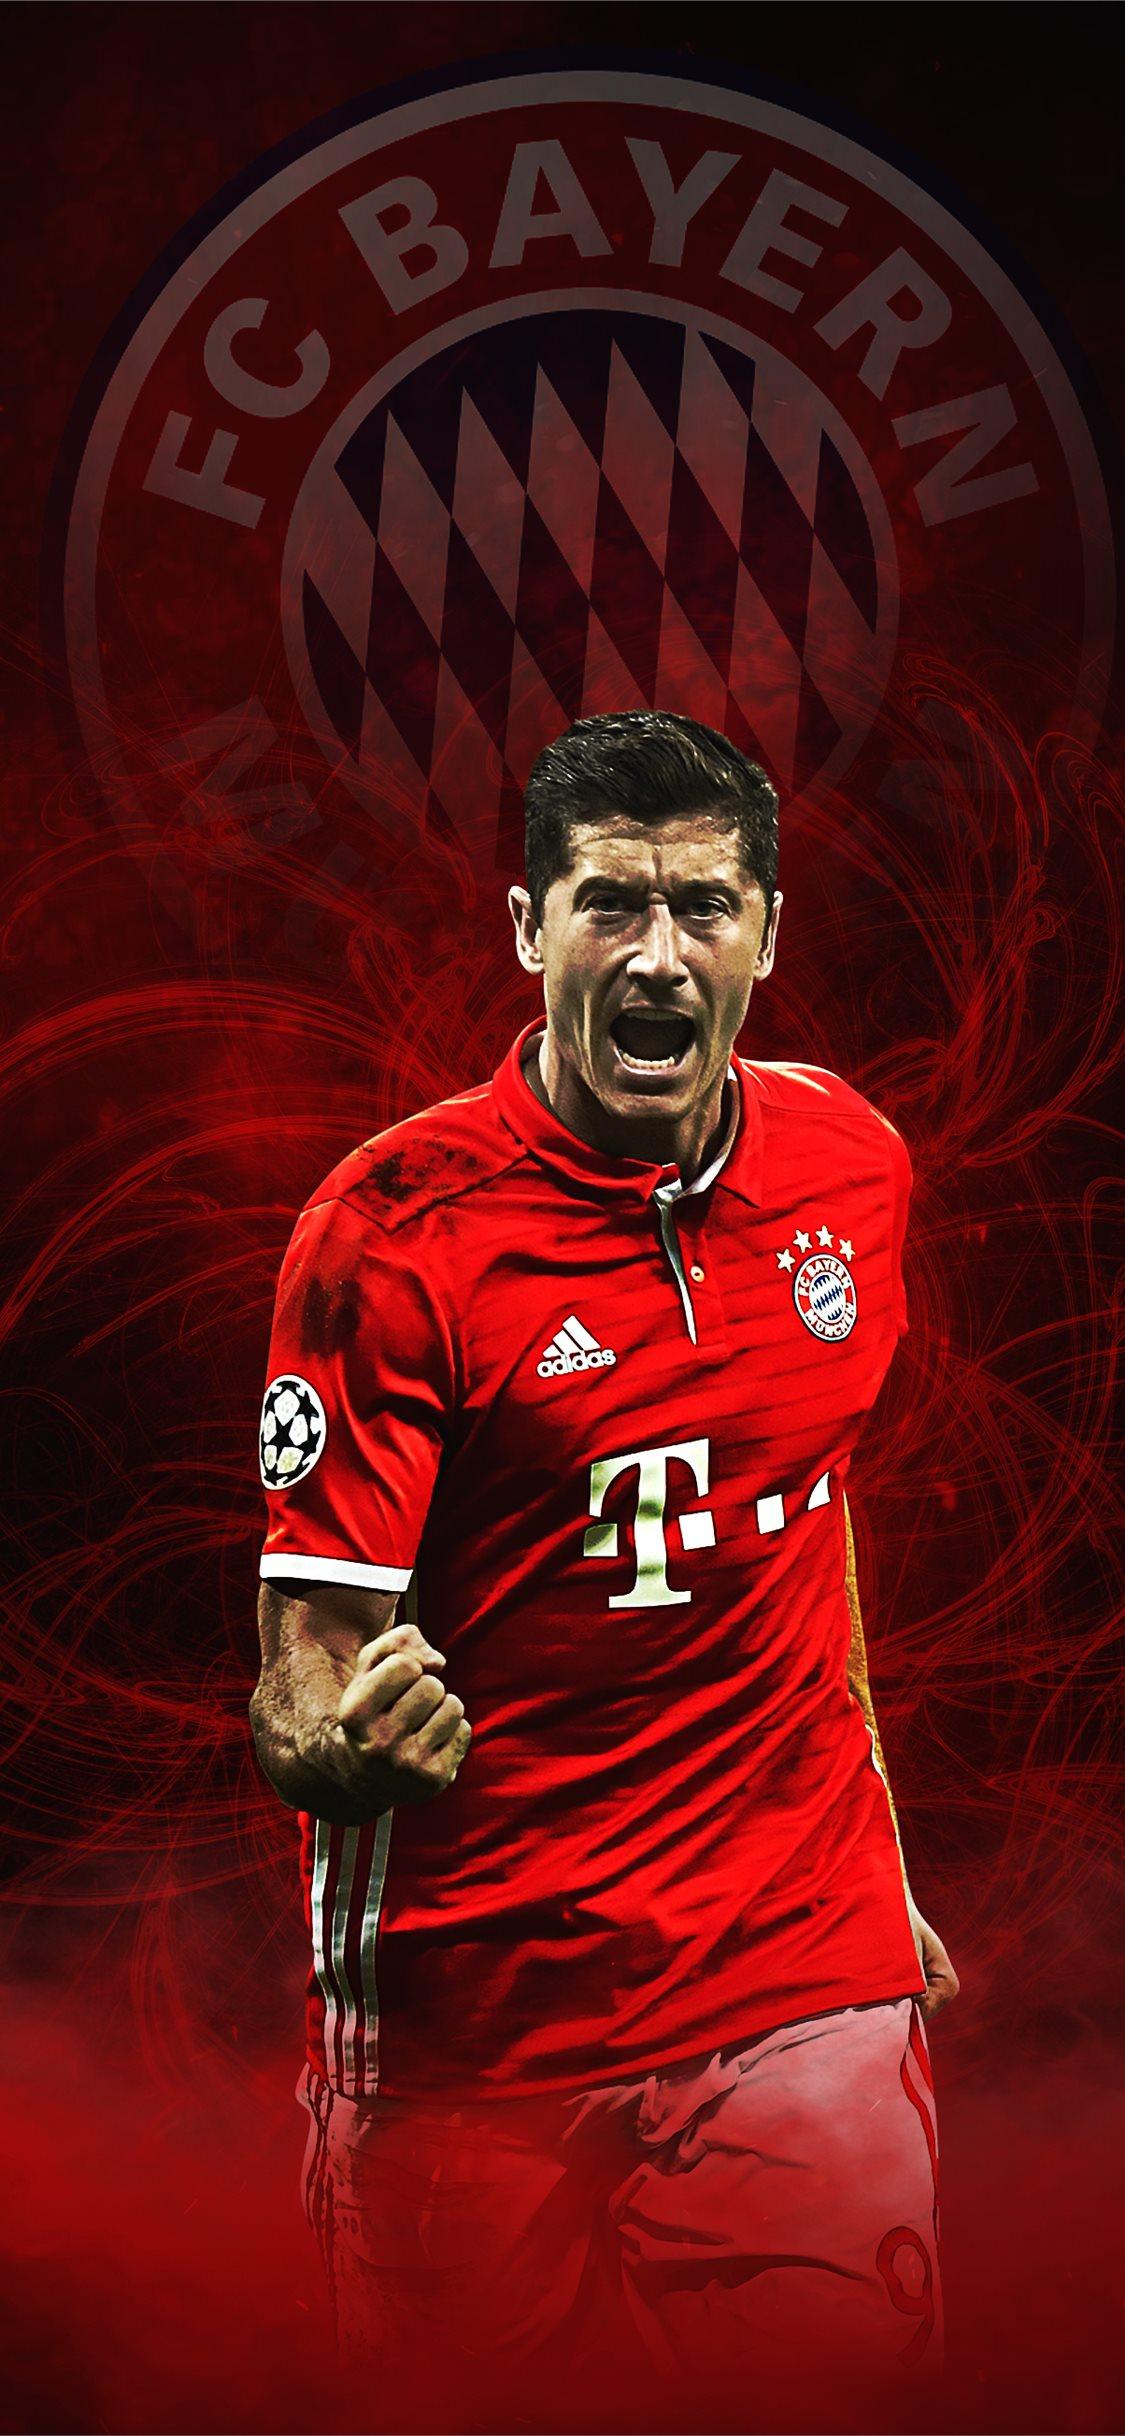 98 Lewandowski Bayern Munich On Afari Iphone X Wallpapers Free Download